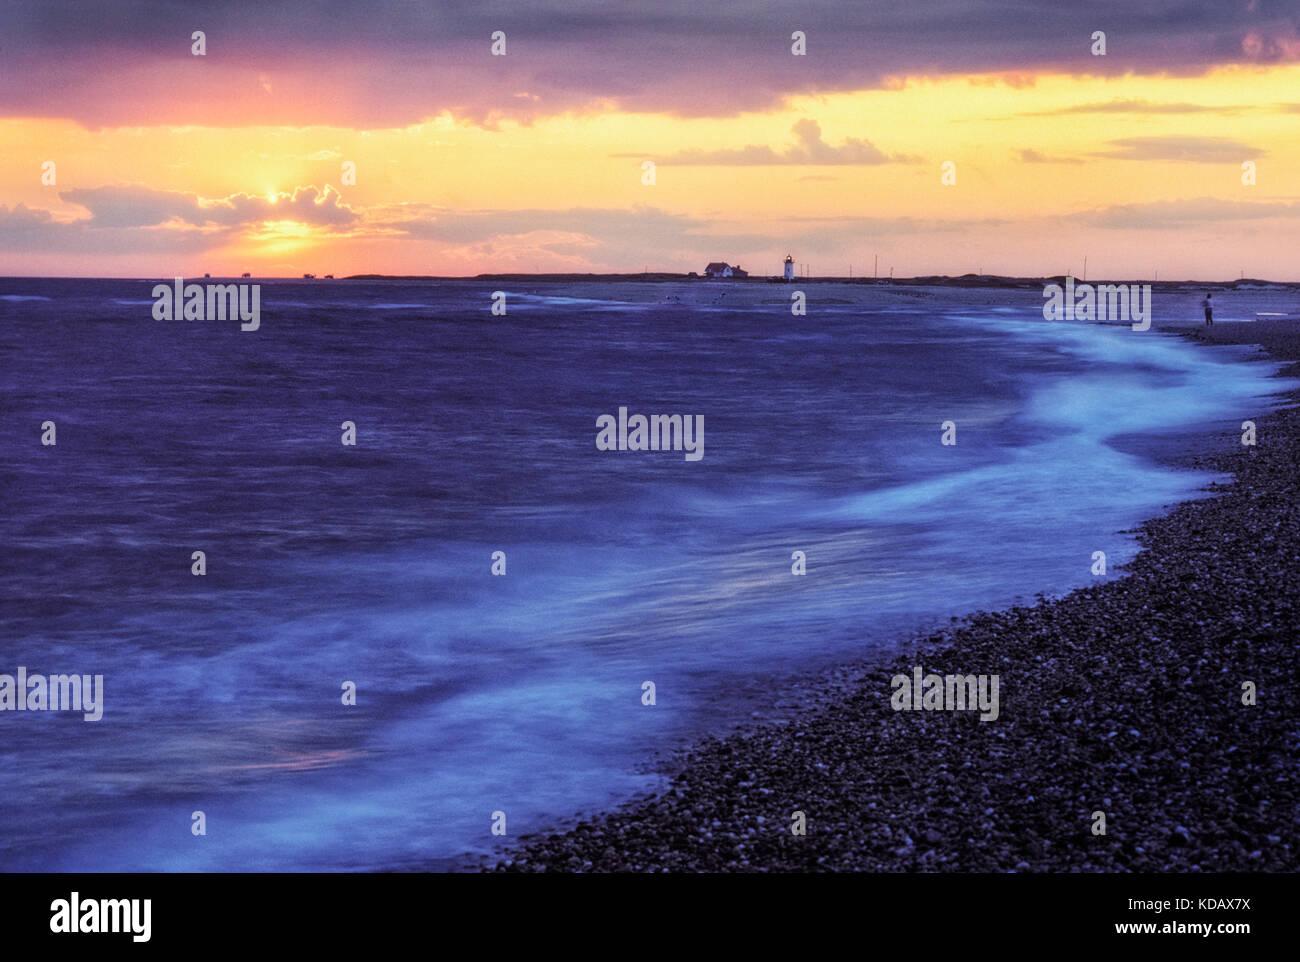 Race Point Lighthouse, Herring Cove Beach, Provincetown, Cape Cod National Seashore, Massachusetts - Stock Image